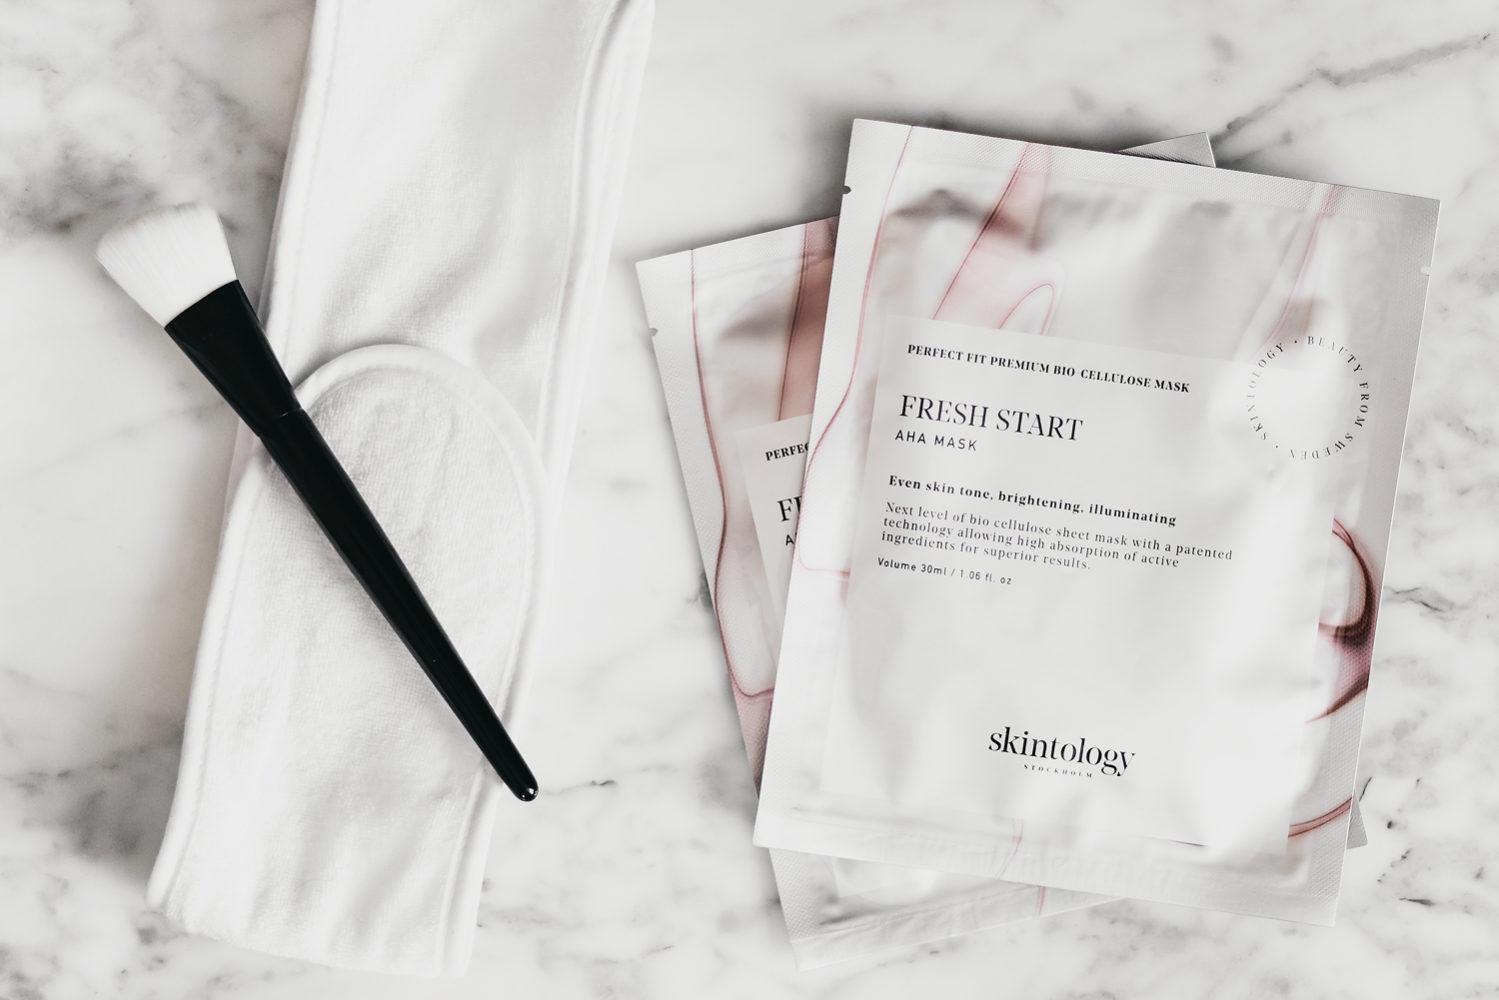 skintology fresh start aha mask